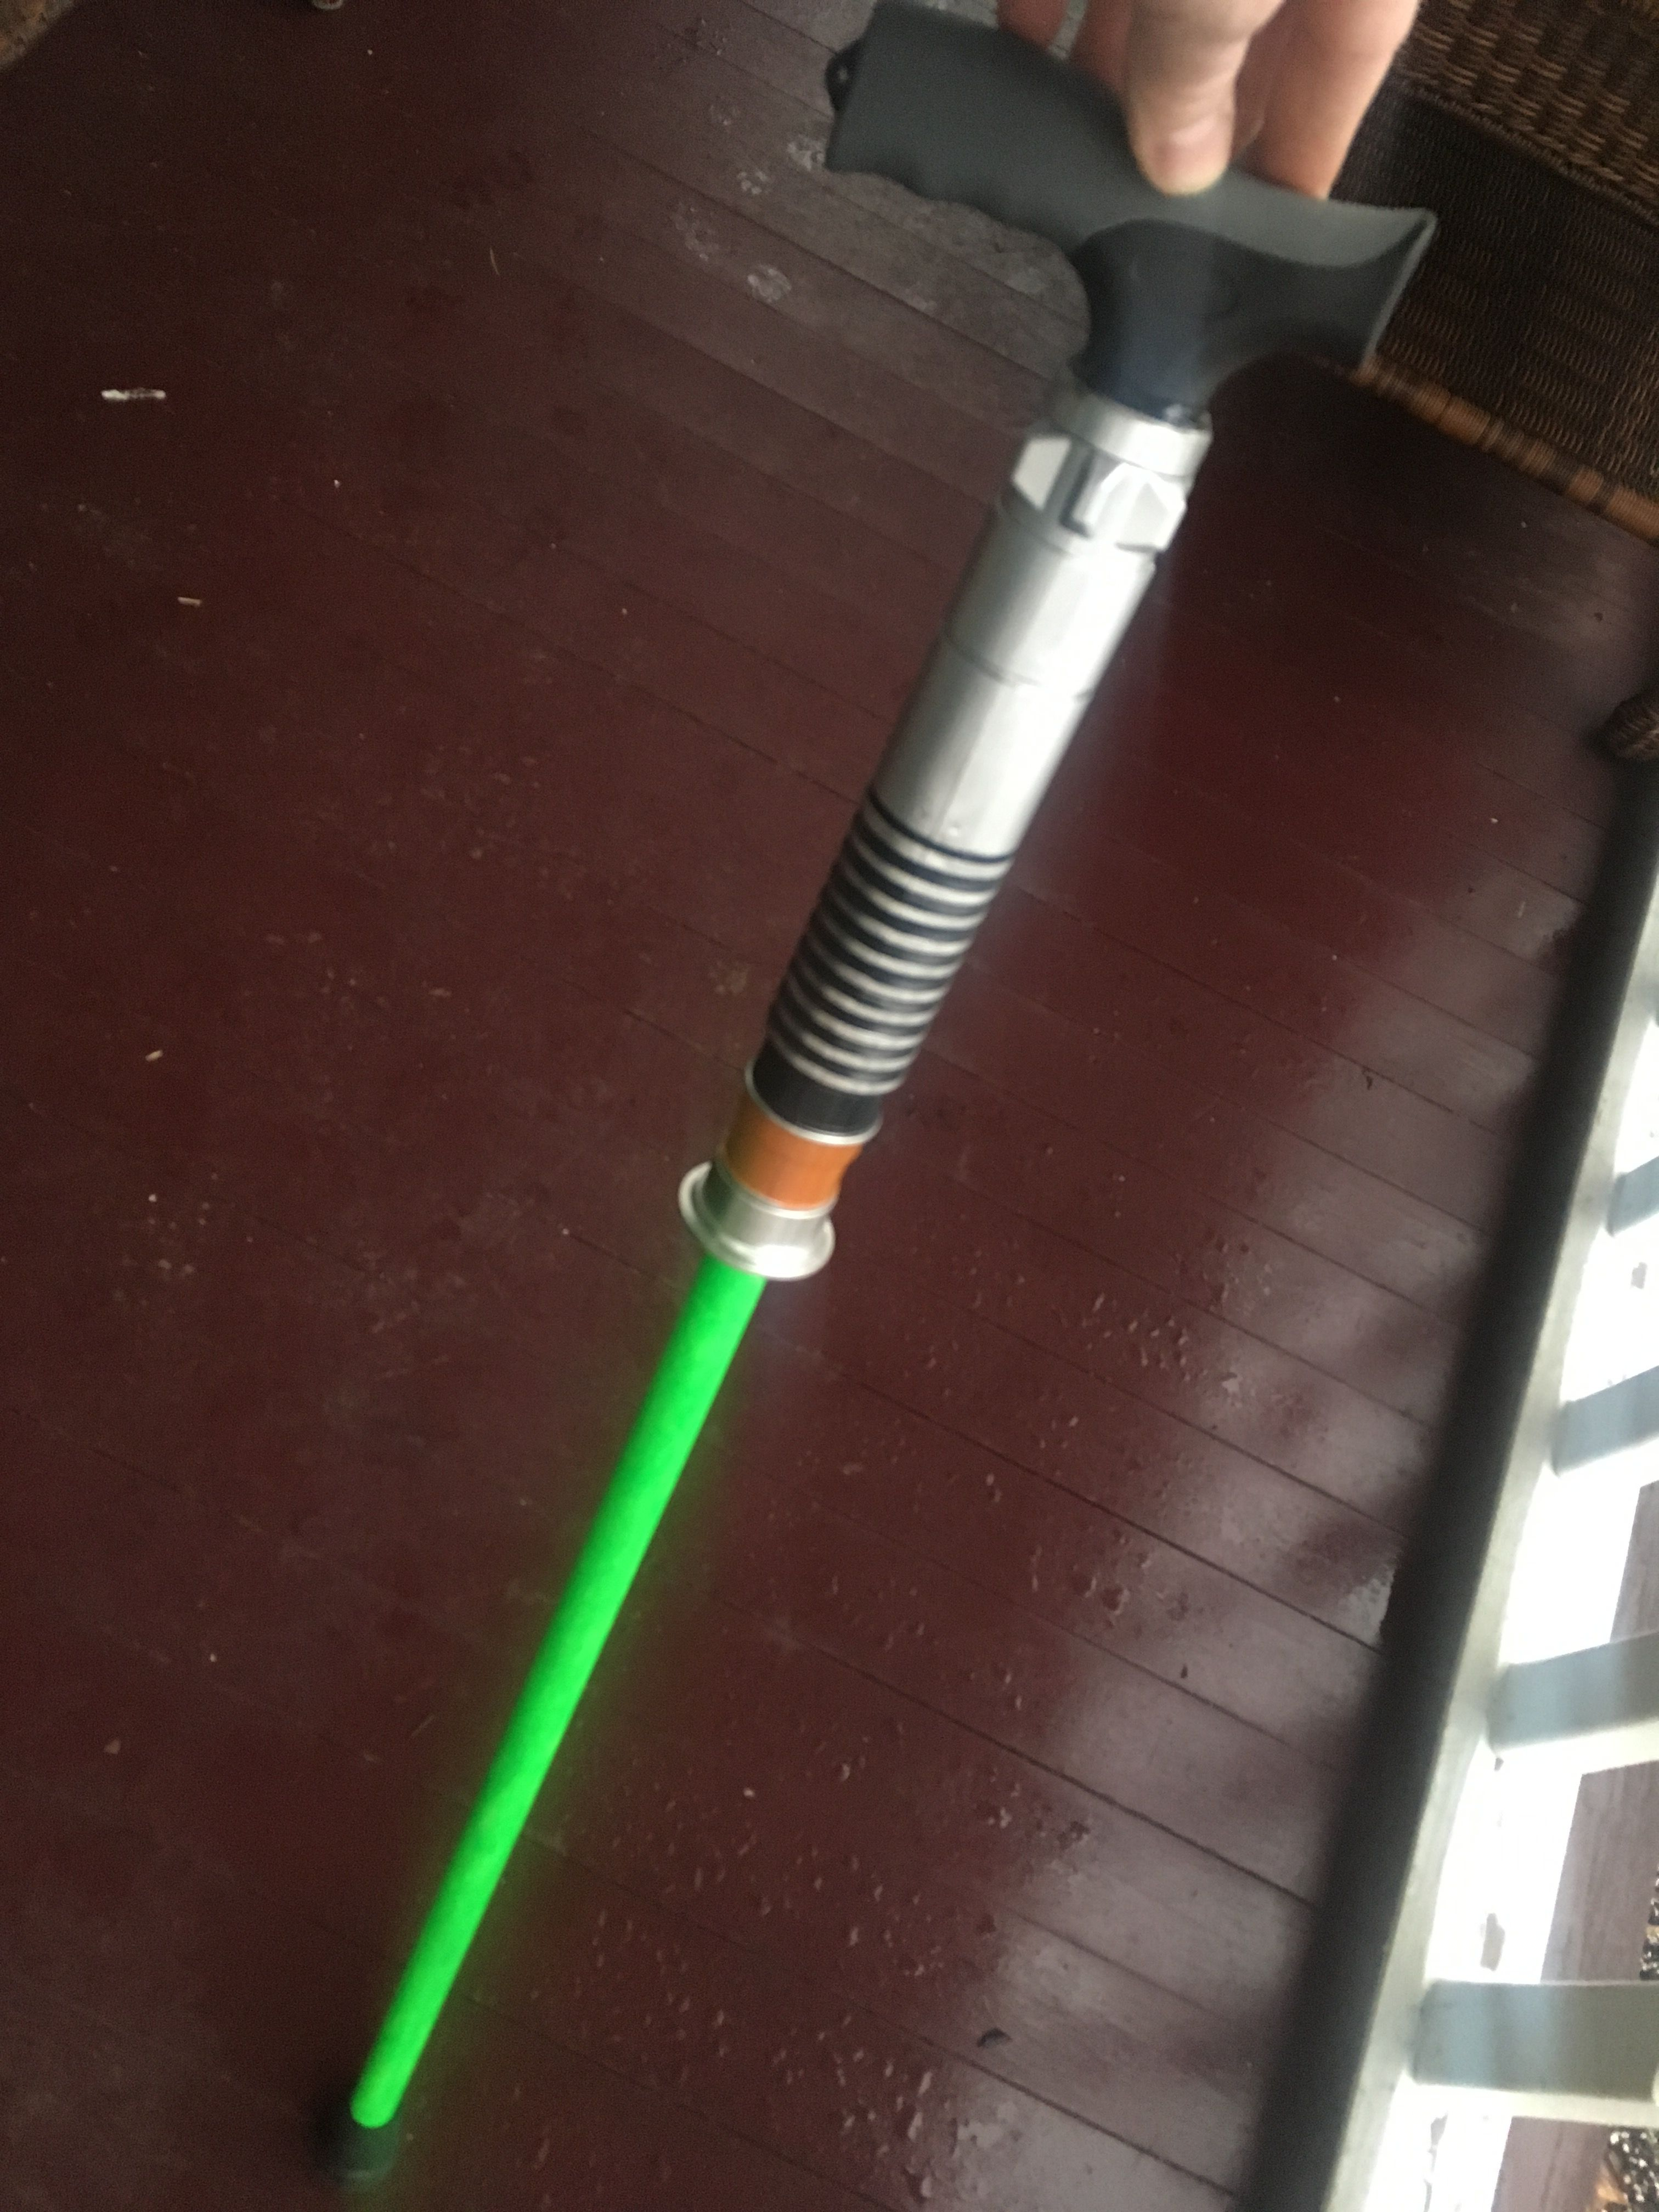 Lightsaber style custom walking cane by @thegoblinworkshop  Neon